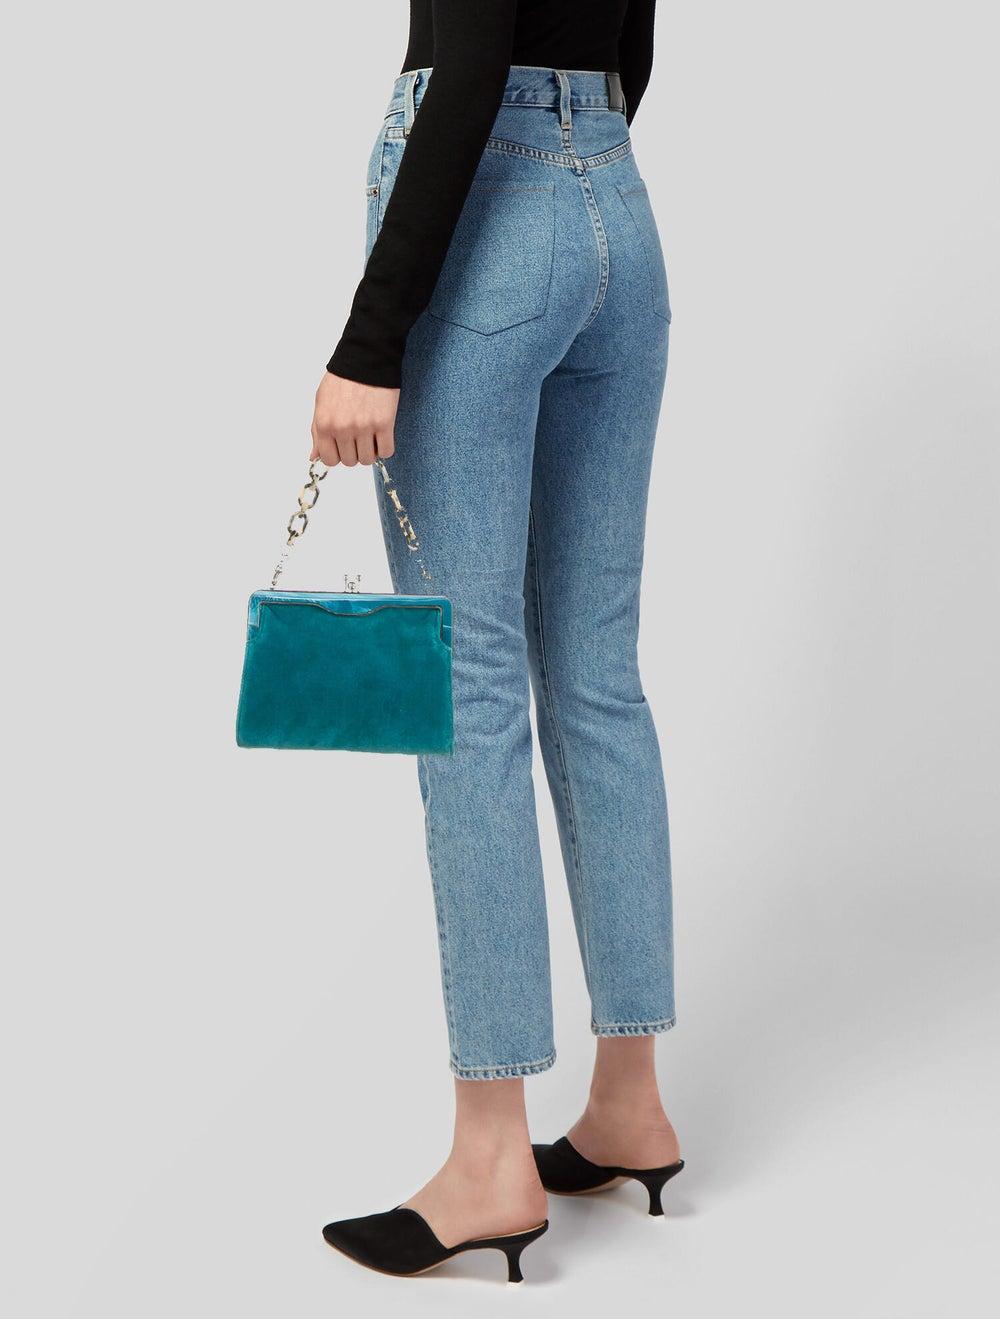 Edie Parker Velvet Handle Bag Green - image 2